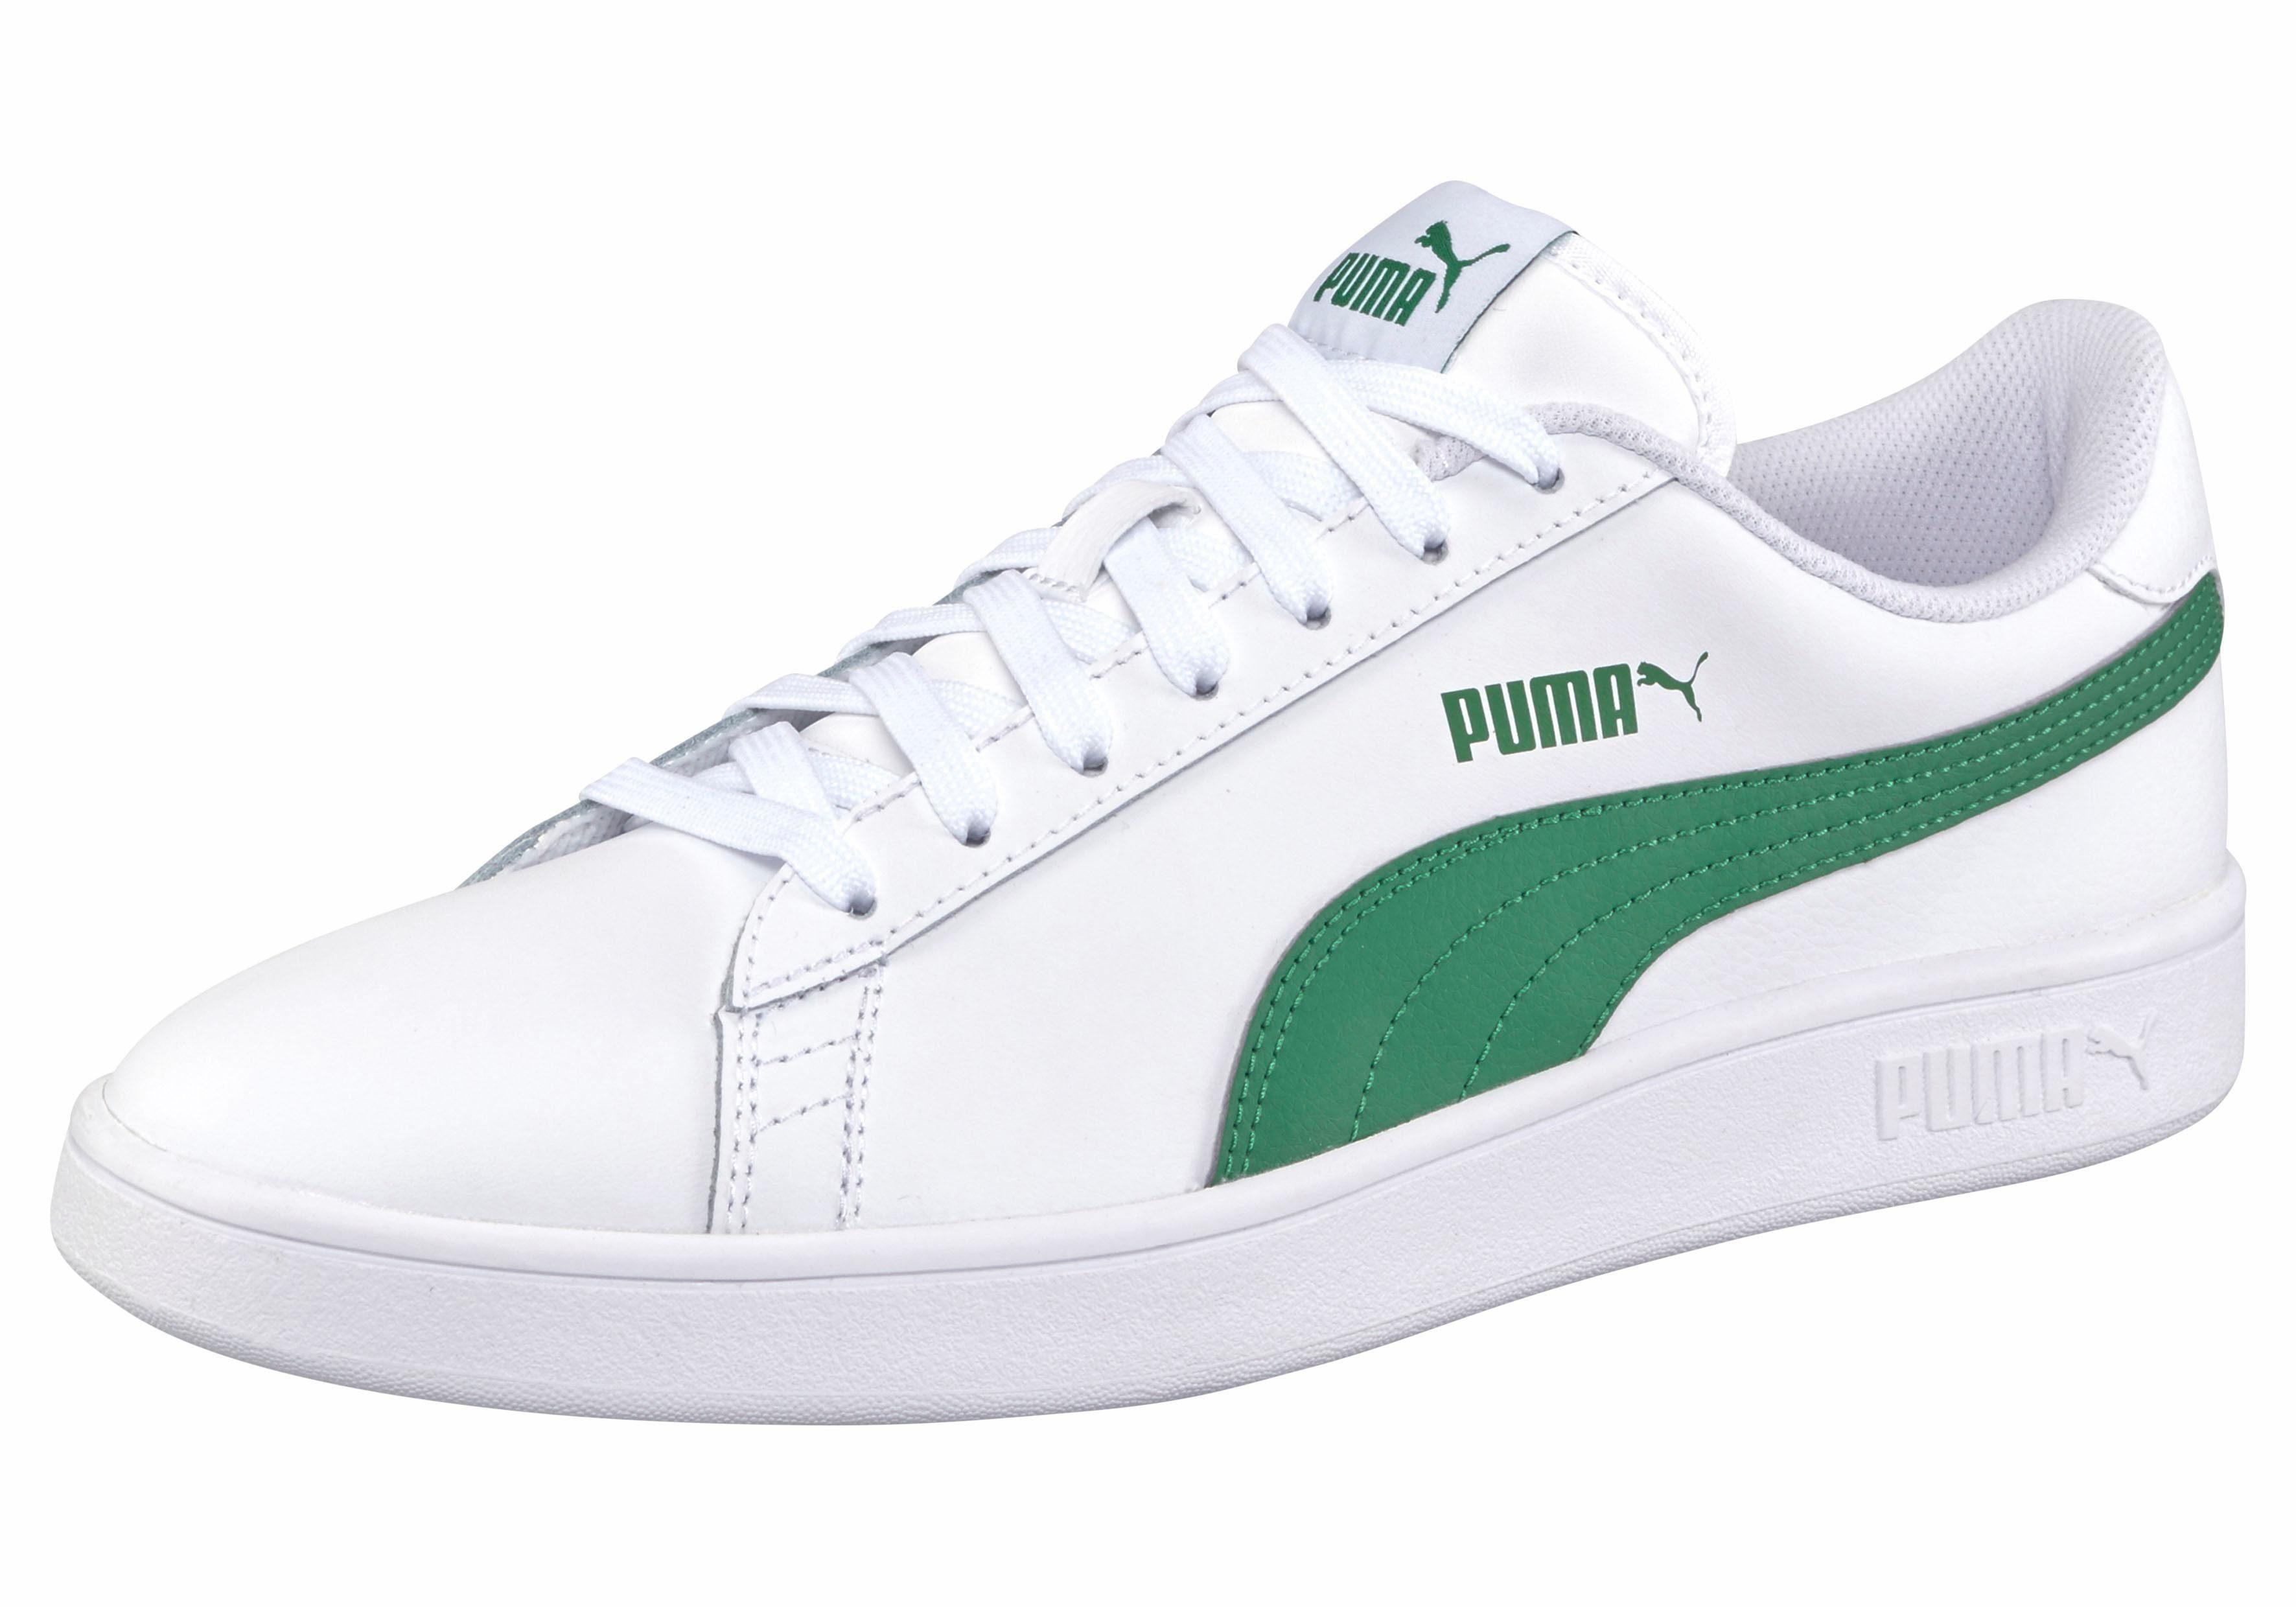 PUMA Smash v2 L U Sneaker online kaufen  weiß-grün